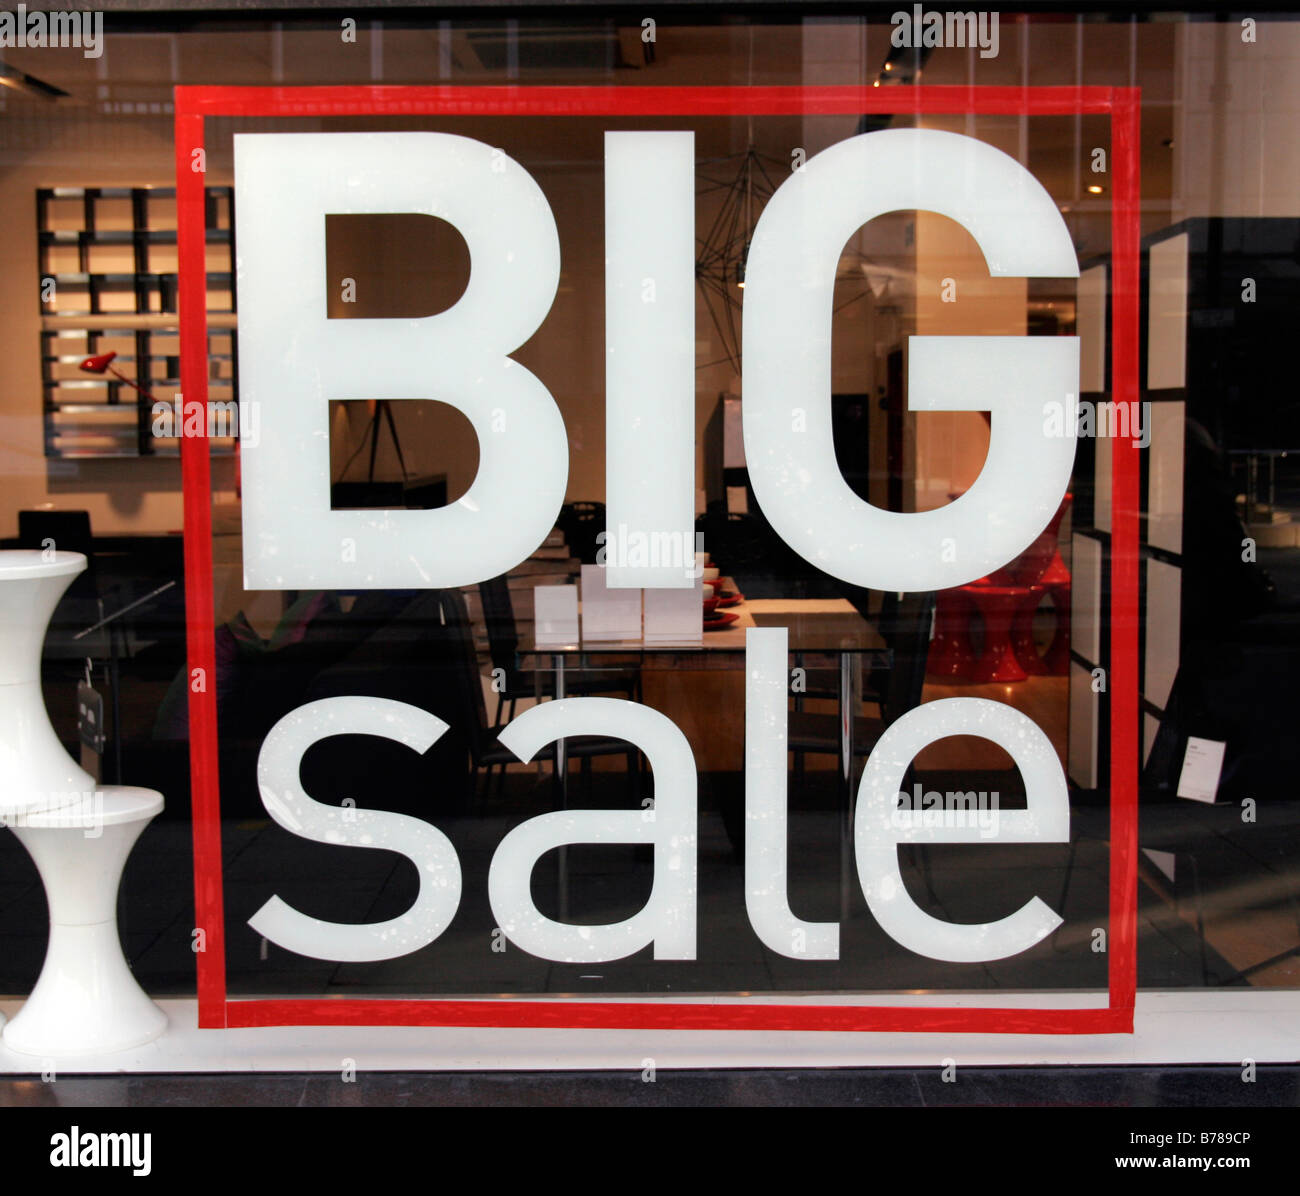 Big Sale sign in Habitat on Tottenham Court Road - Stock Image